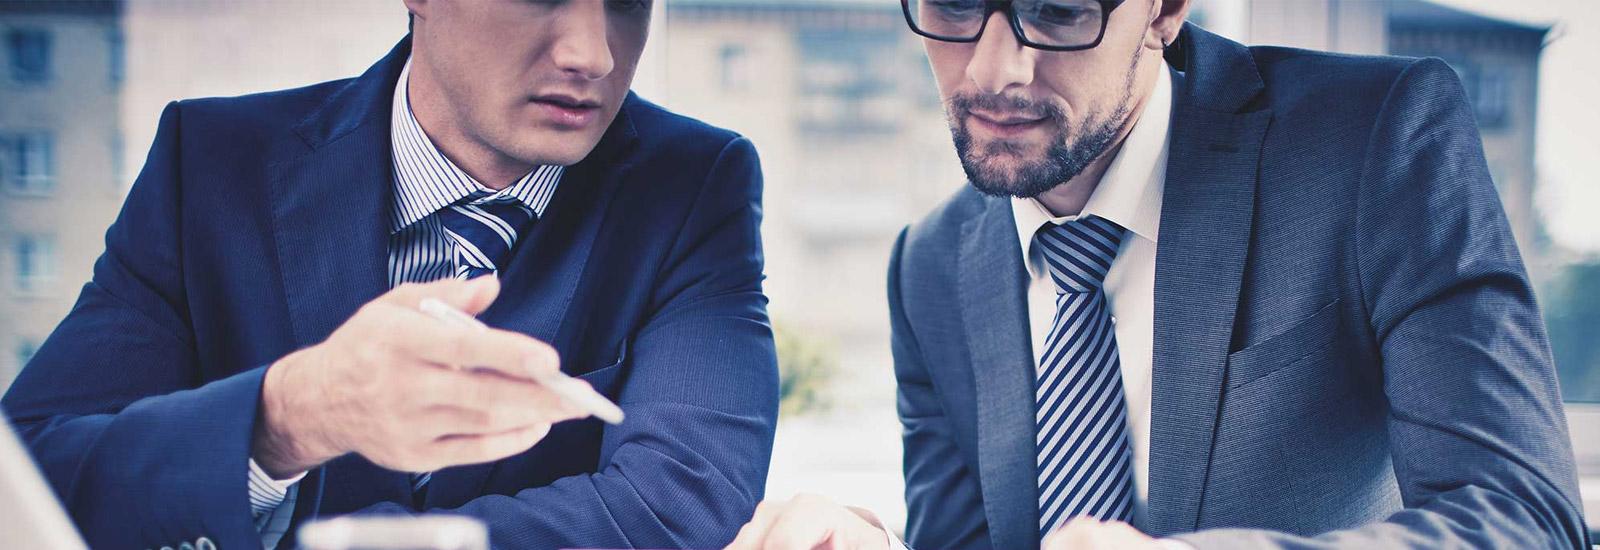 «Private business consulting»: η εξωτερική οικονομική διεύθυνση